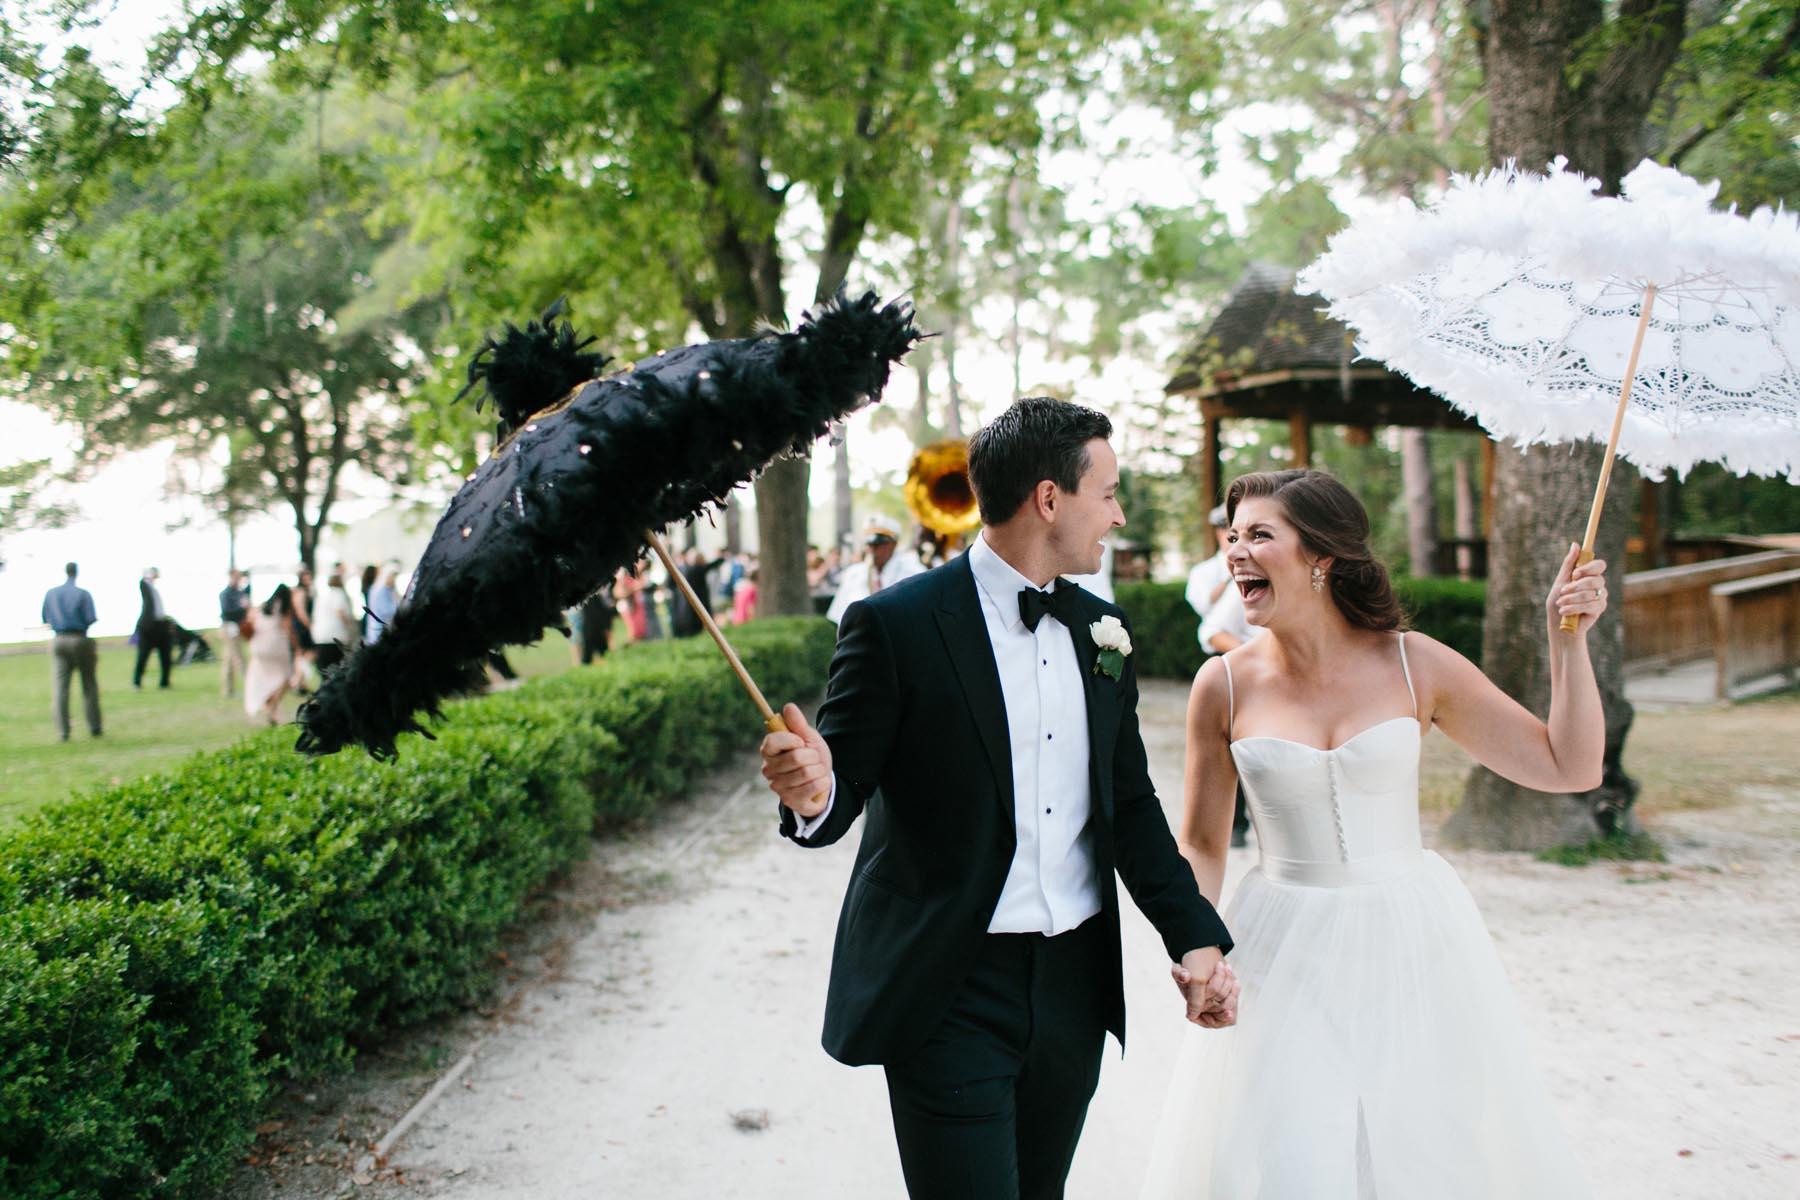 lowry wedding blog eden garden florida wedding-117